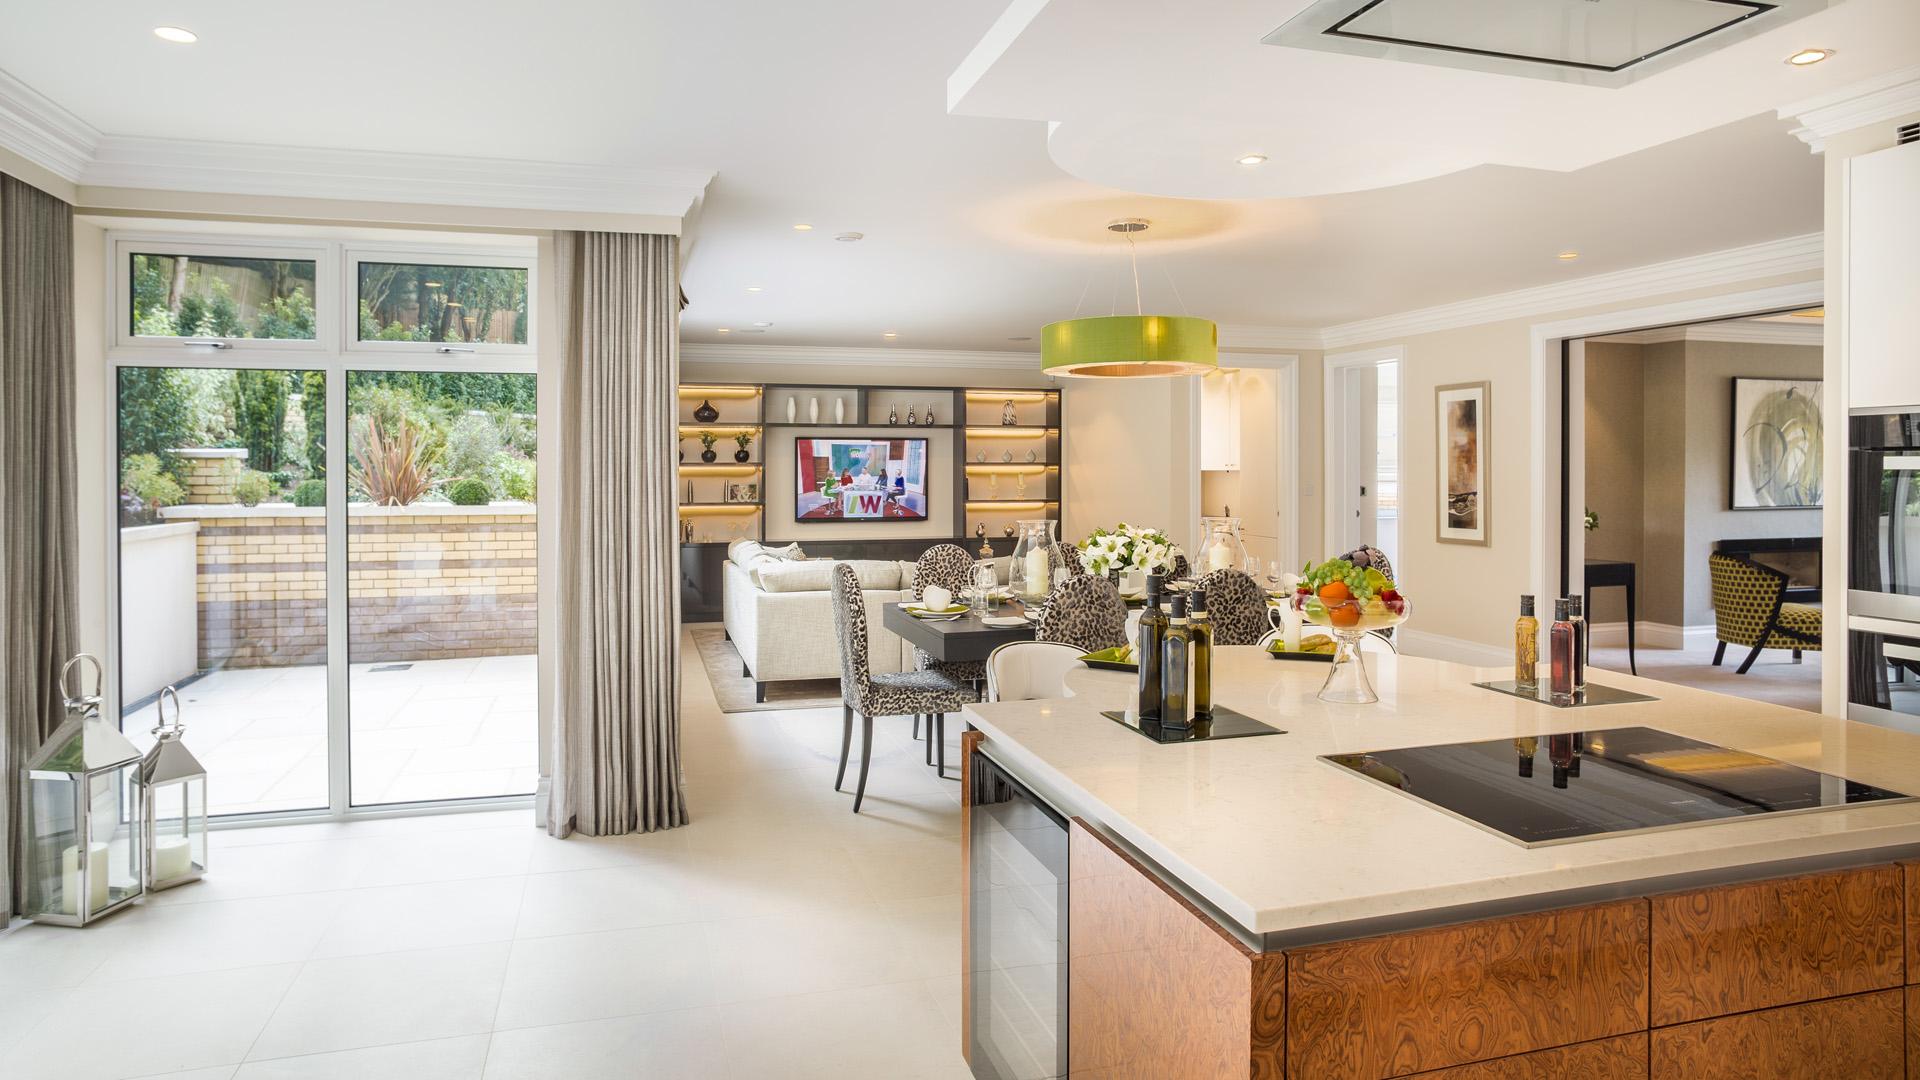 Development of five luxury apartments buckinghamshire for Co interior